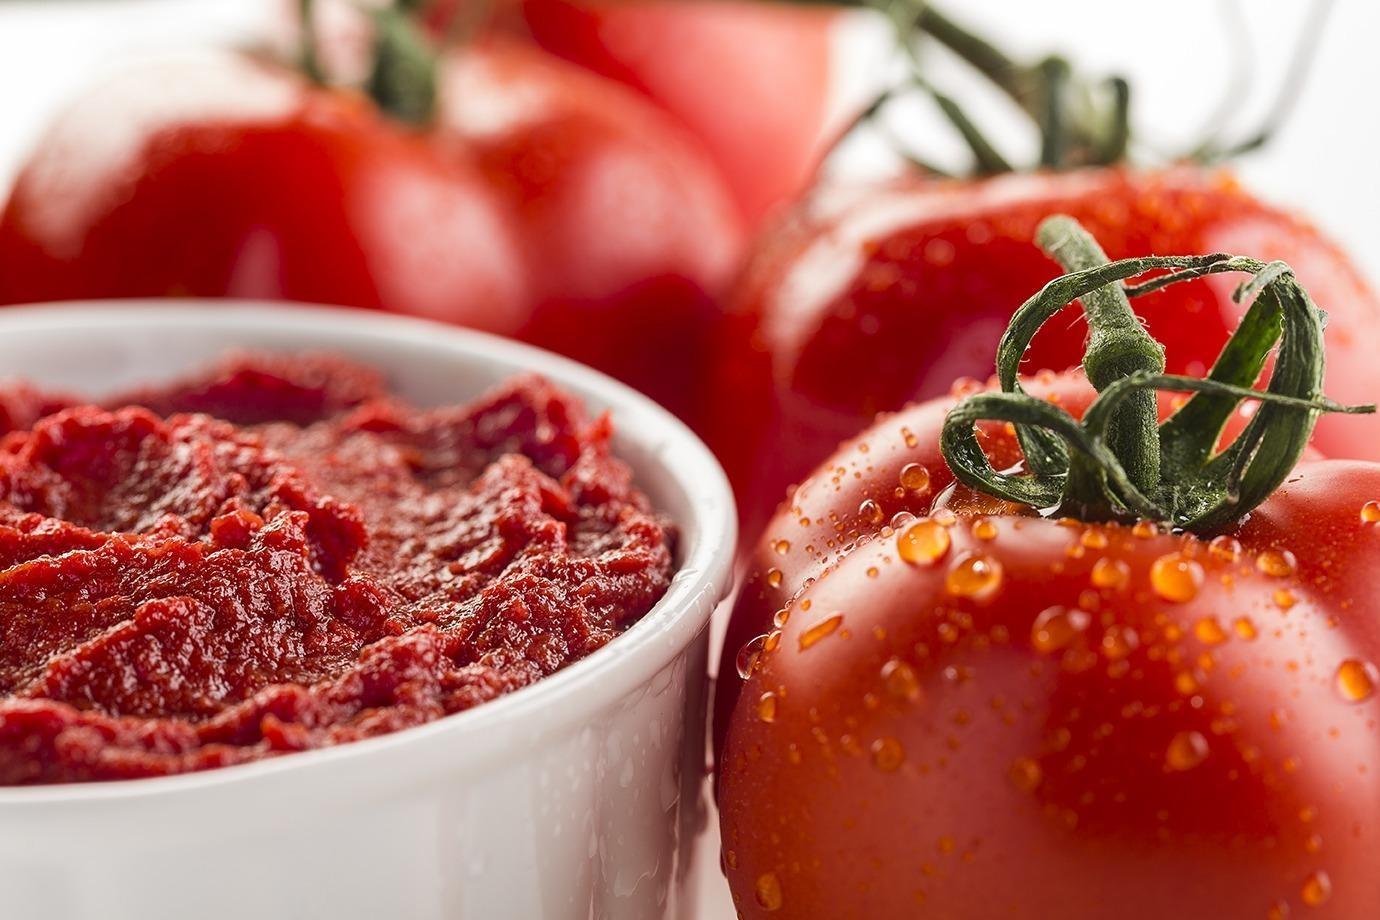 Tomato Paste Production Plant Tomato paste processing machine from Turkey